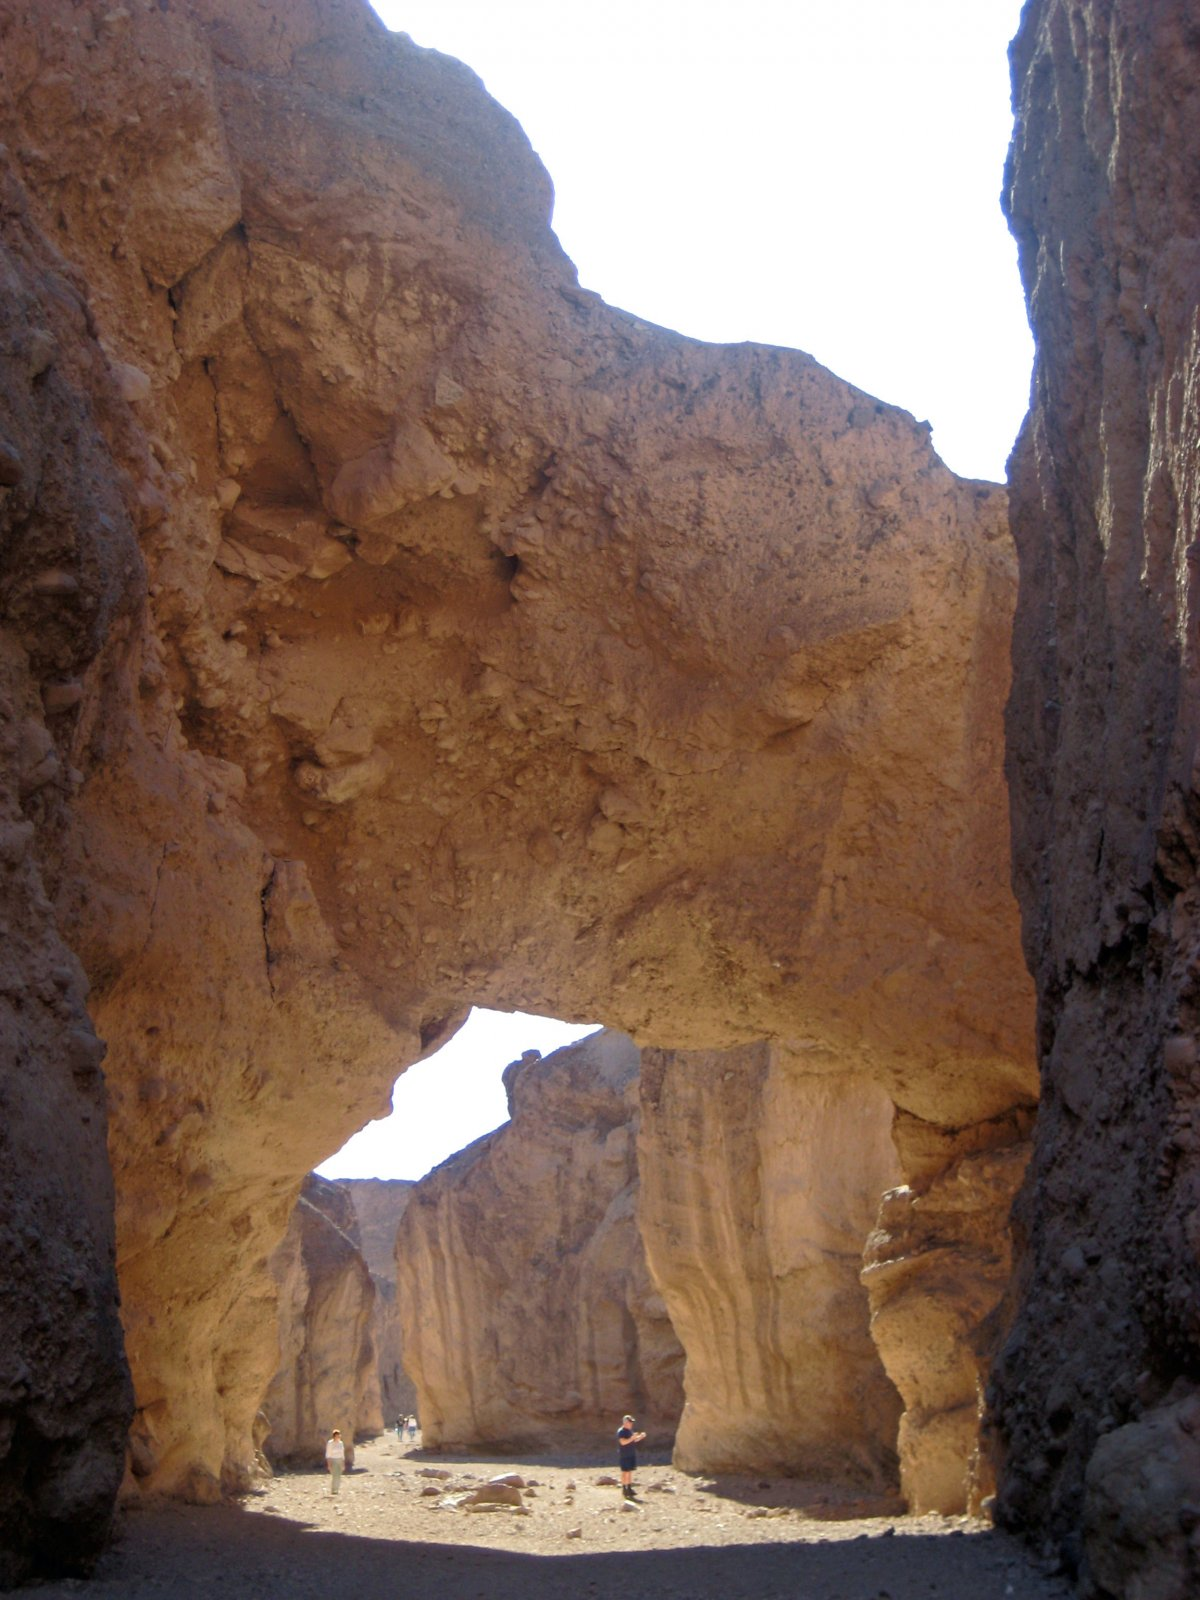 Click image for larger version  Name:Natural Bridge Canyon.jpg Views:82 Size:279.4 KB ID:116597